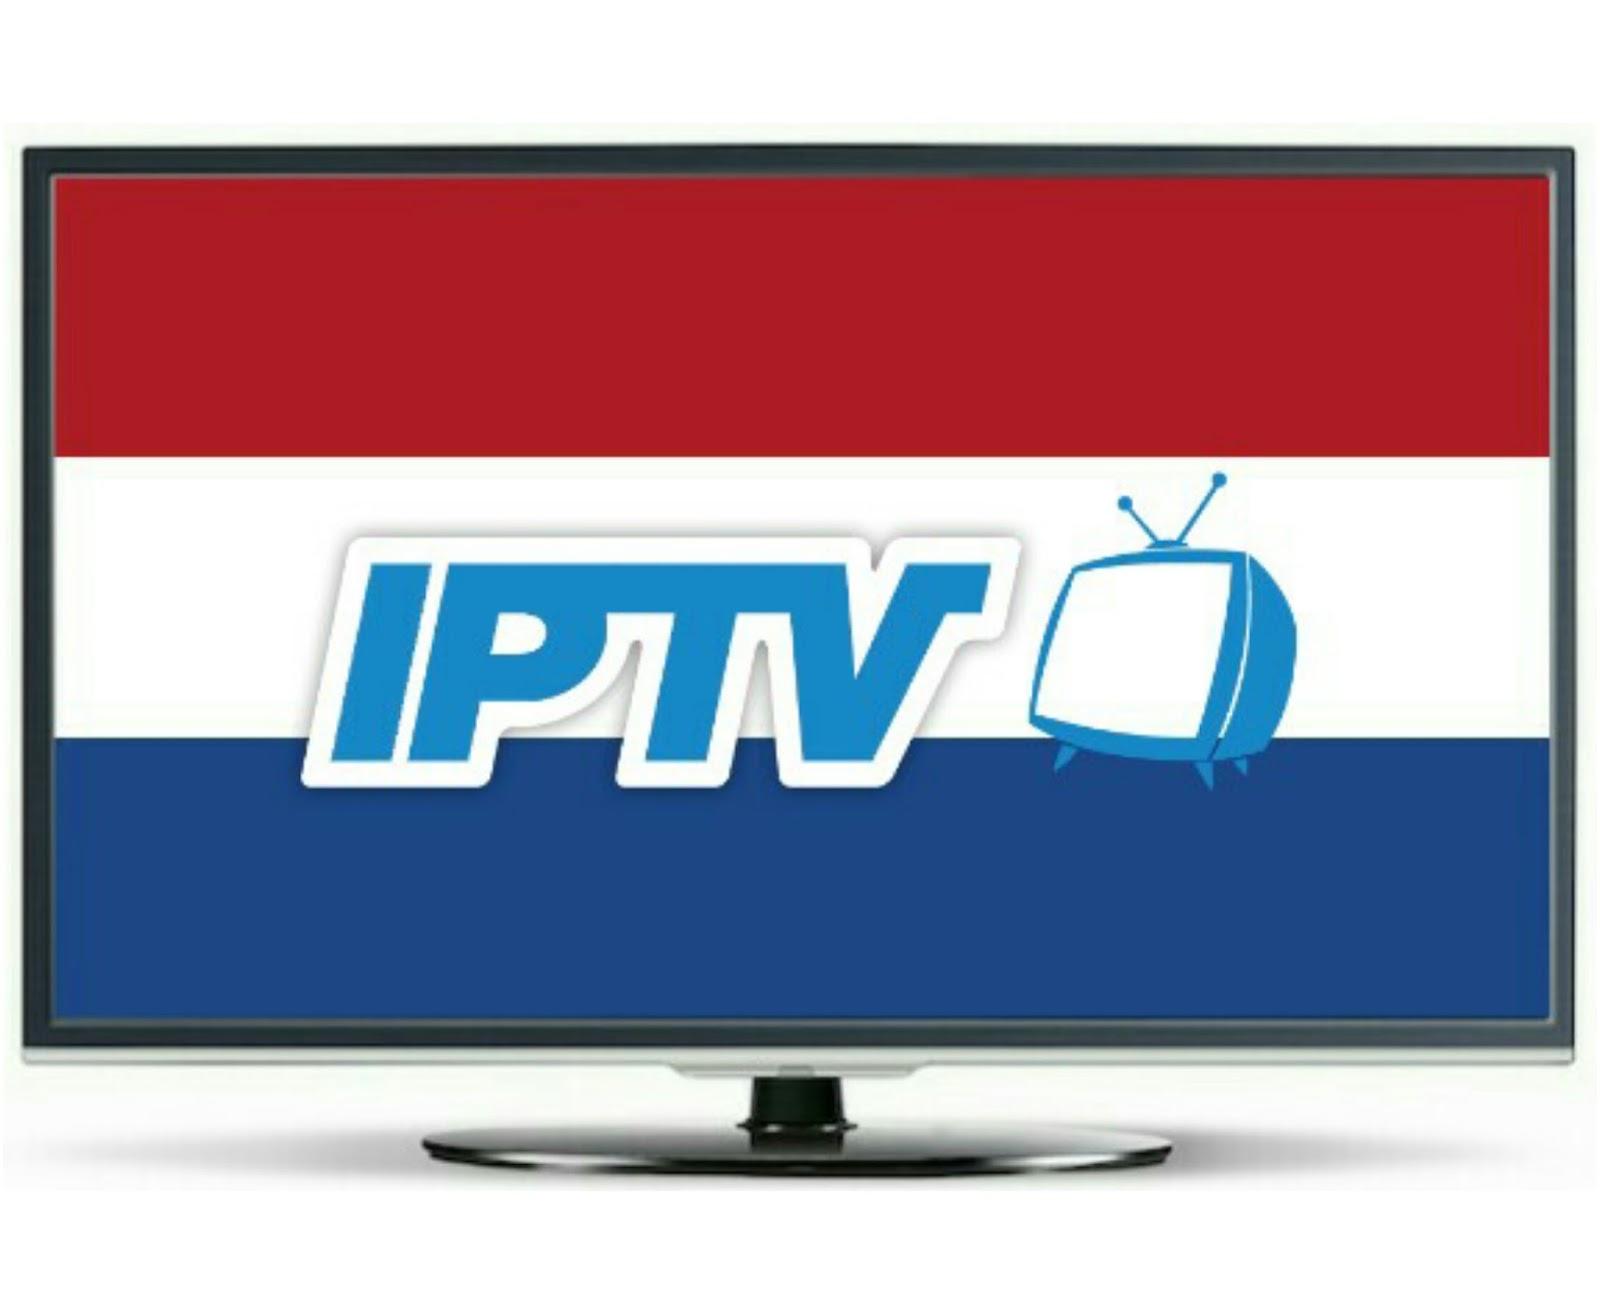 Full Iptv Netherland Free Iptv Free Download 27-10-2019